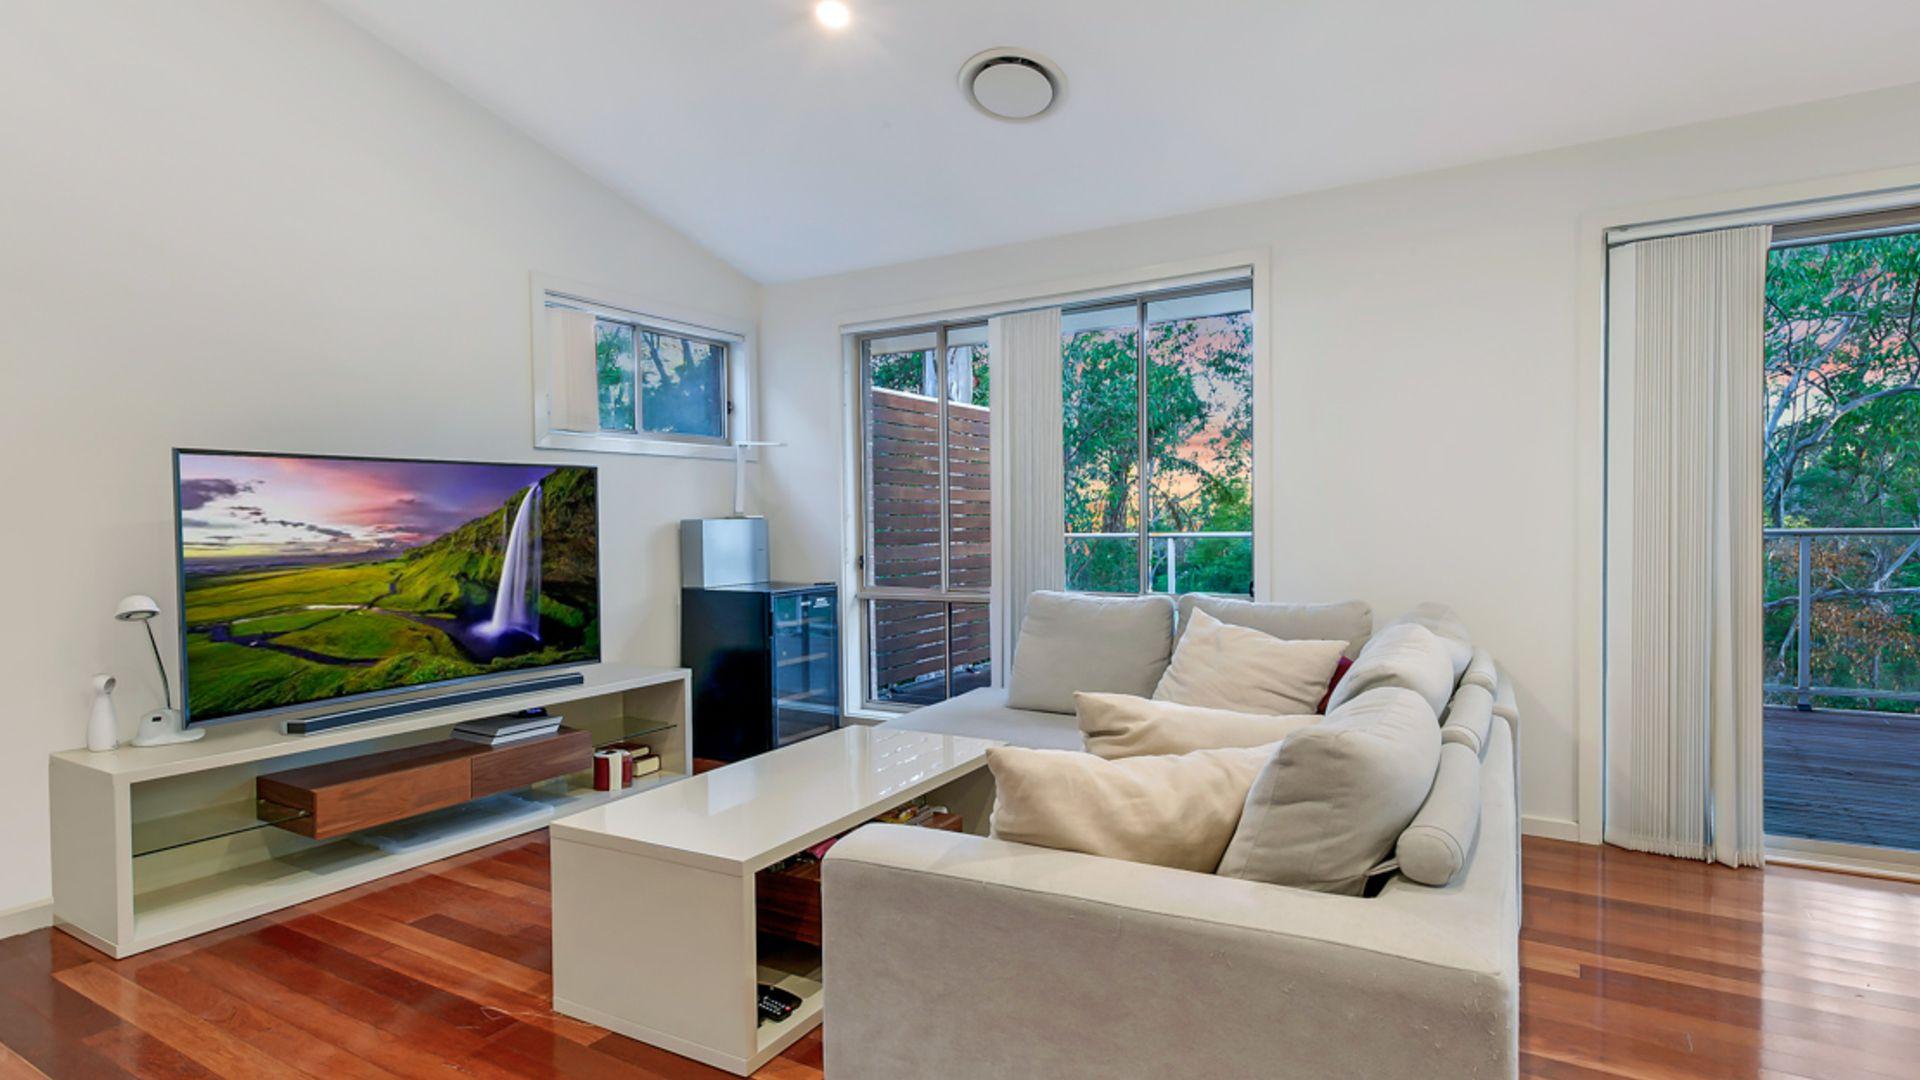 5 Brecks Way, Pennant Hills NSW 2120, Image 1